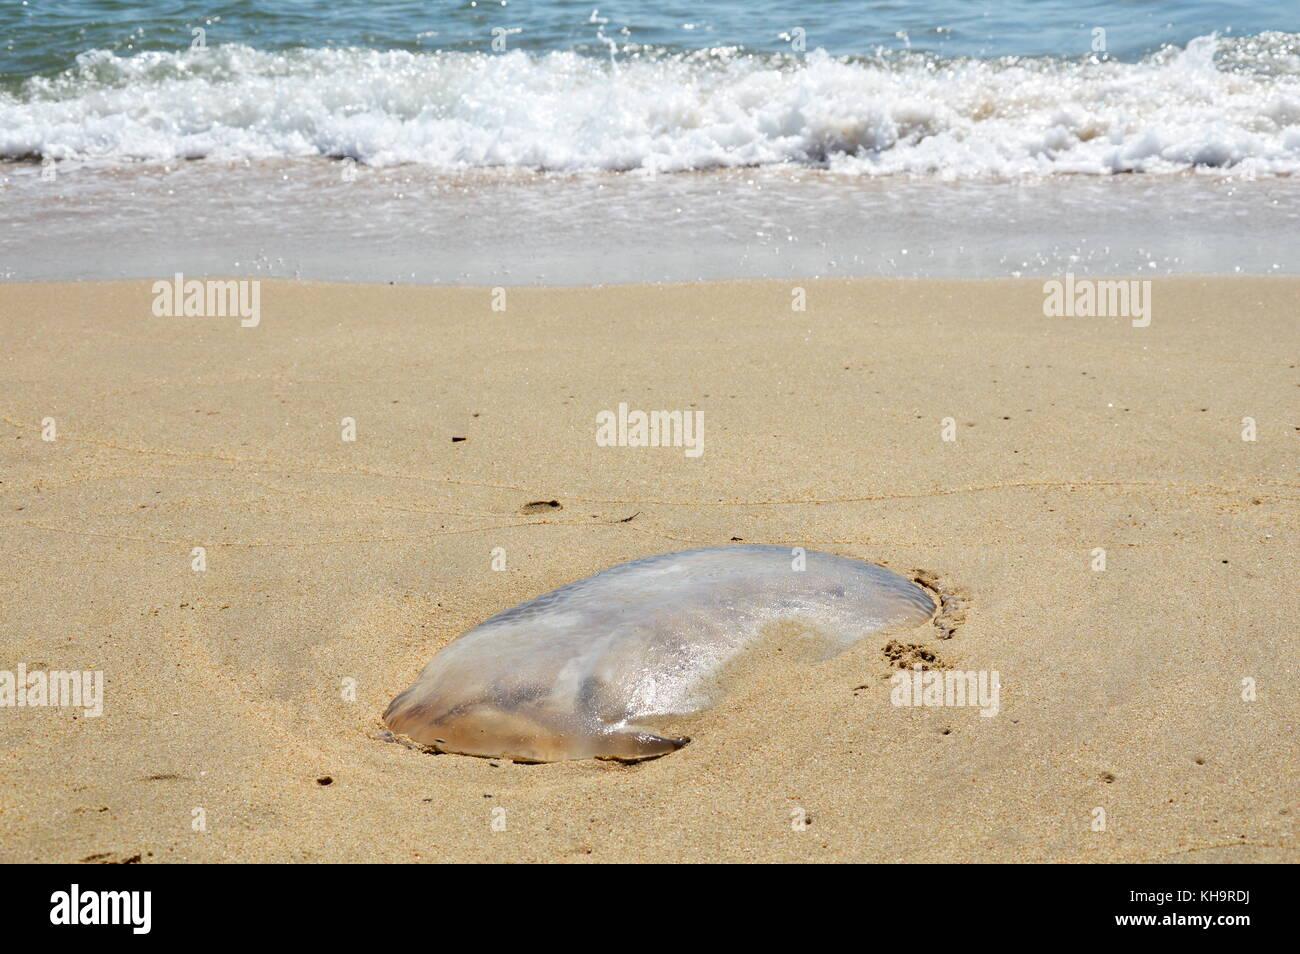 Medusas strand en la playa Imagen De Stock